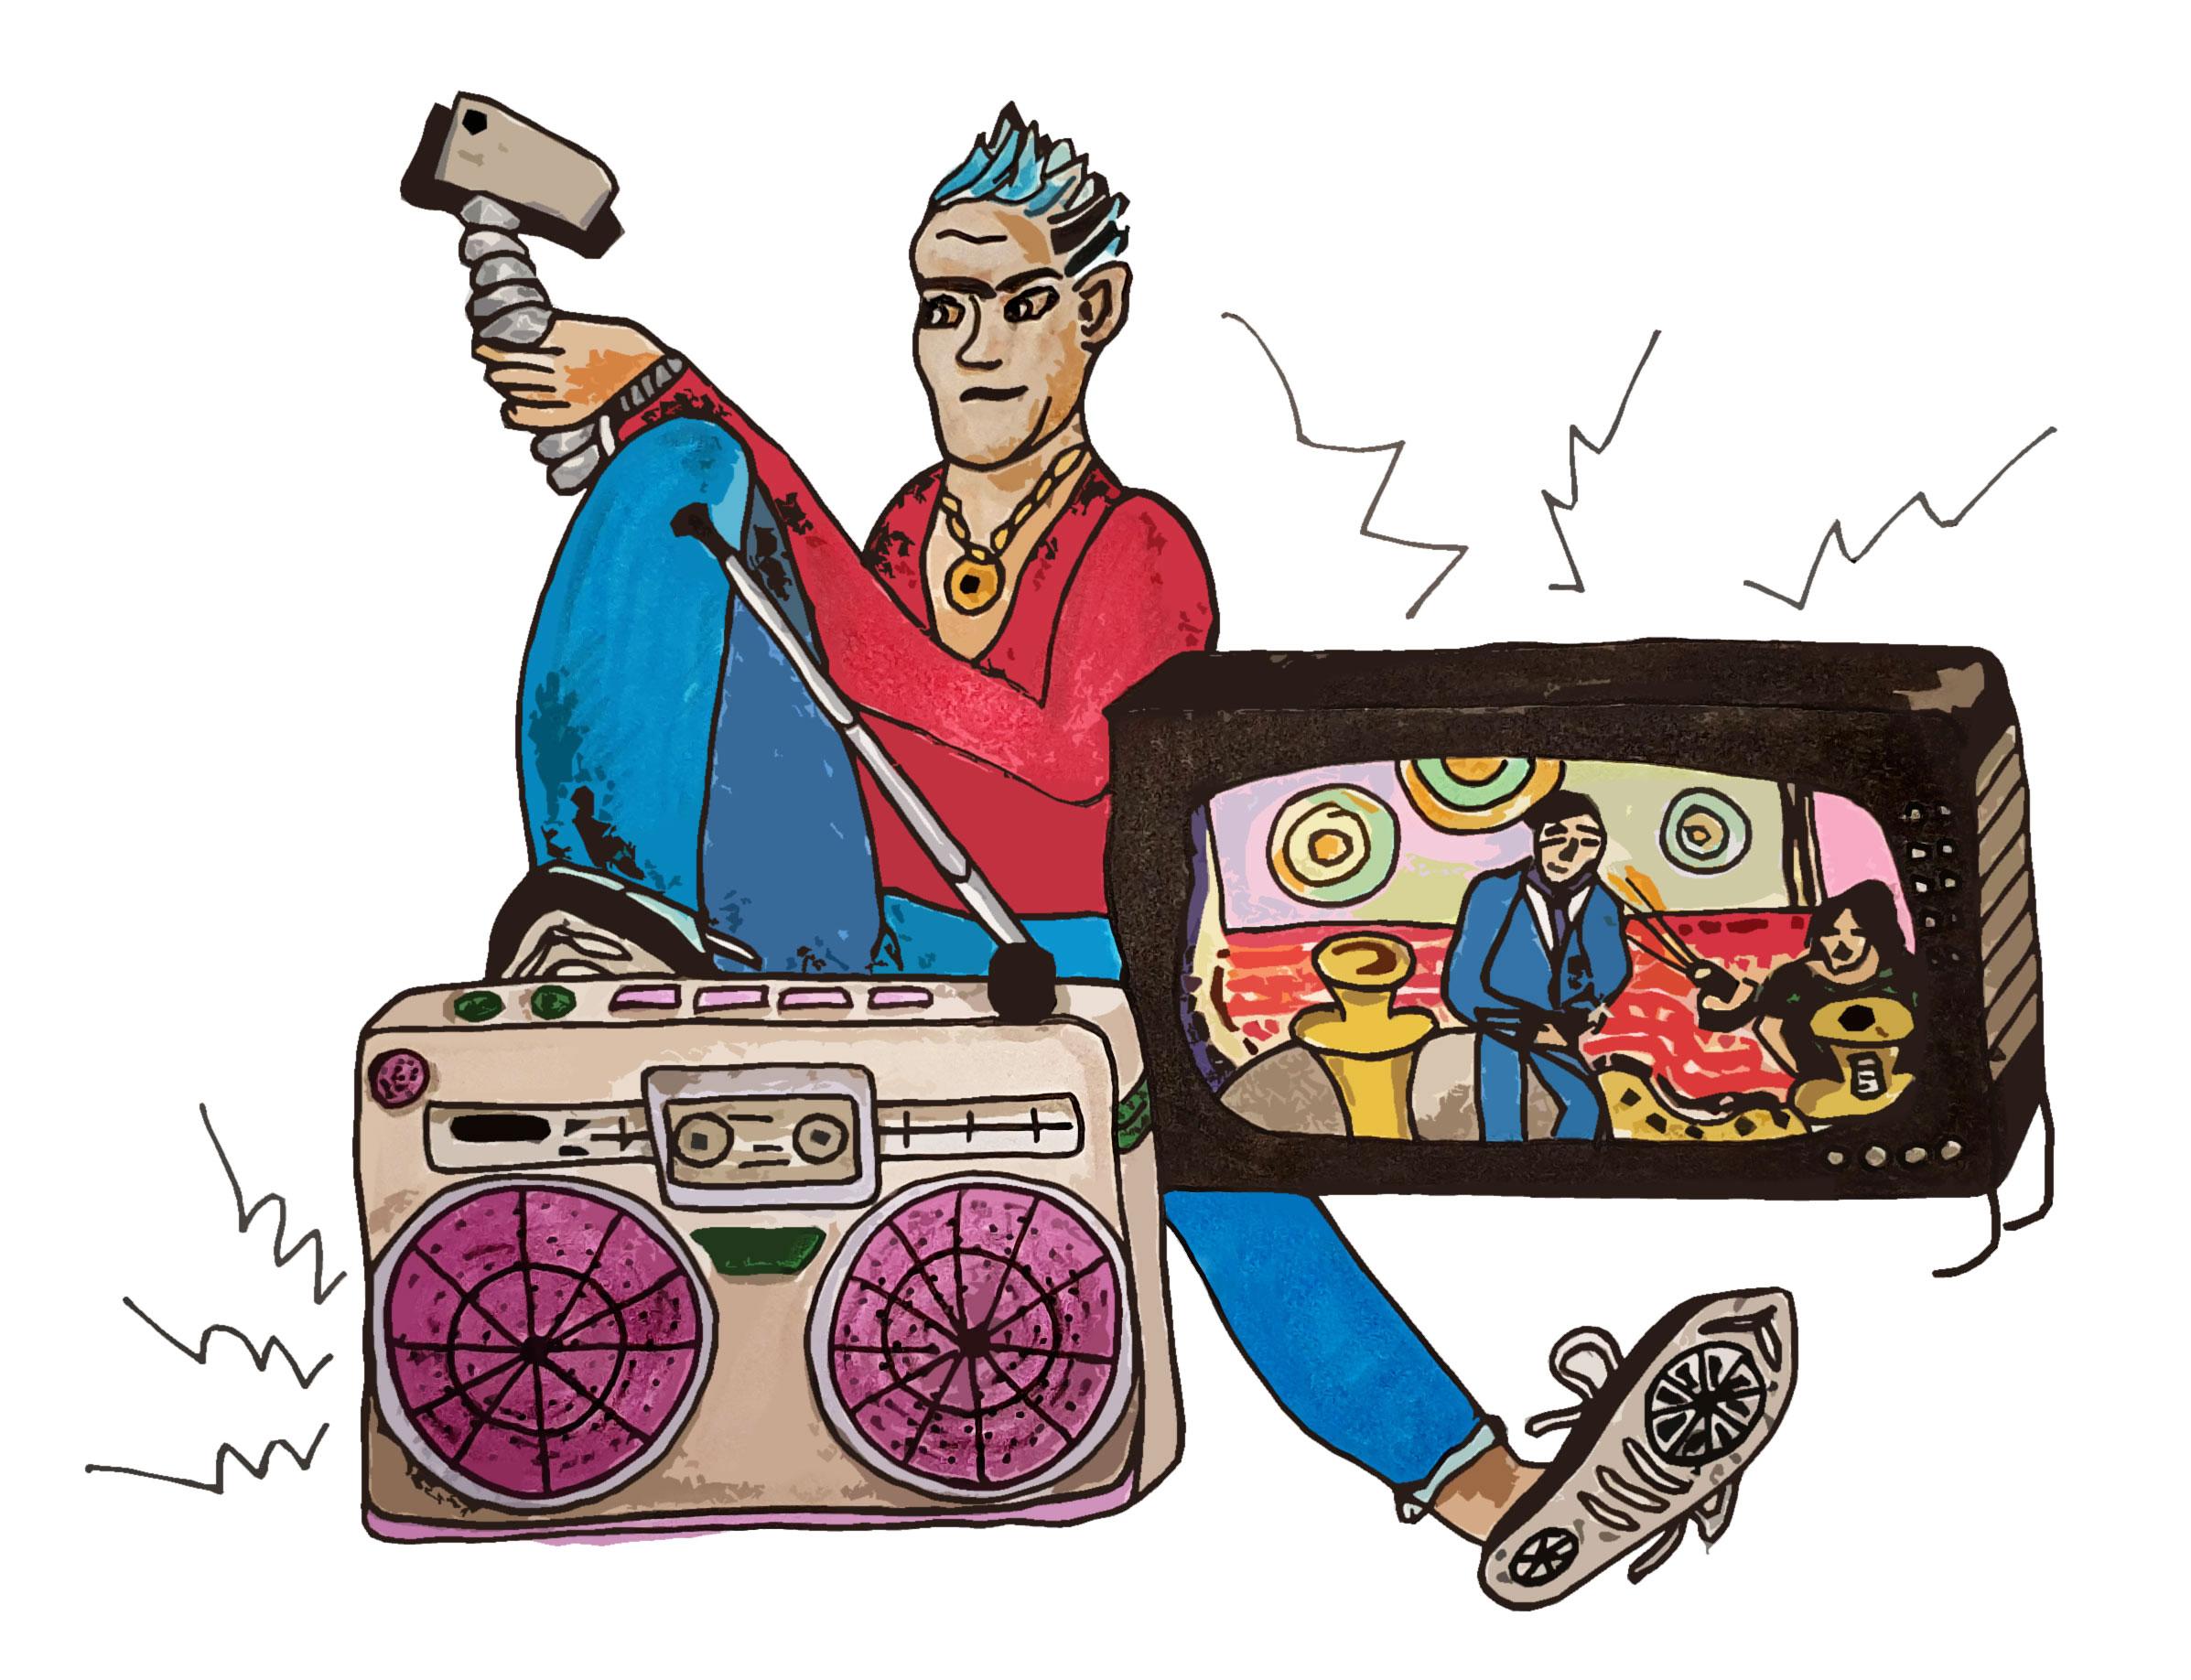 Man vlogging near tv and radio